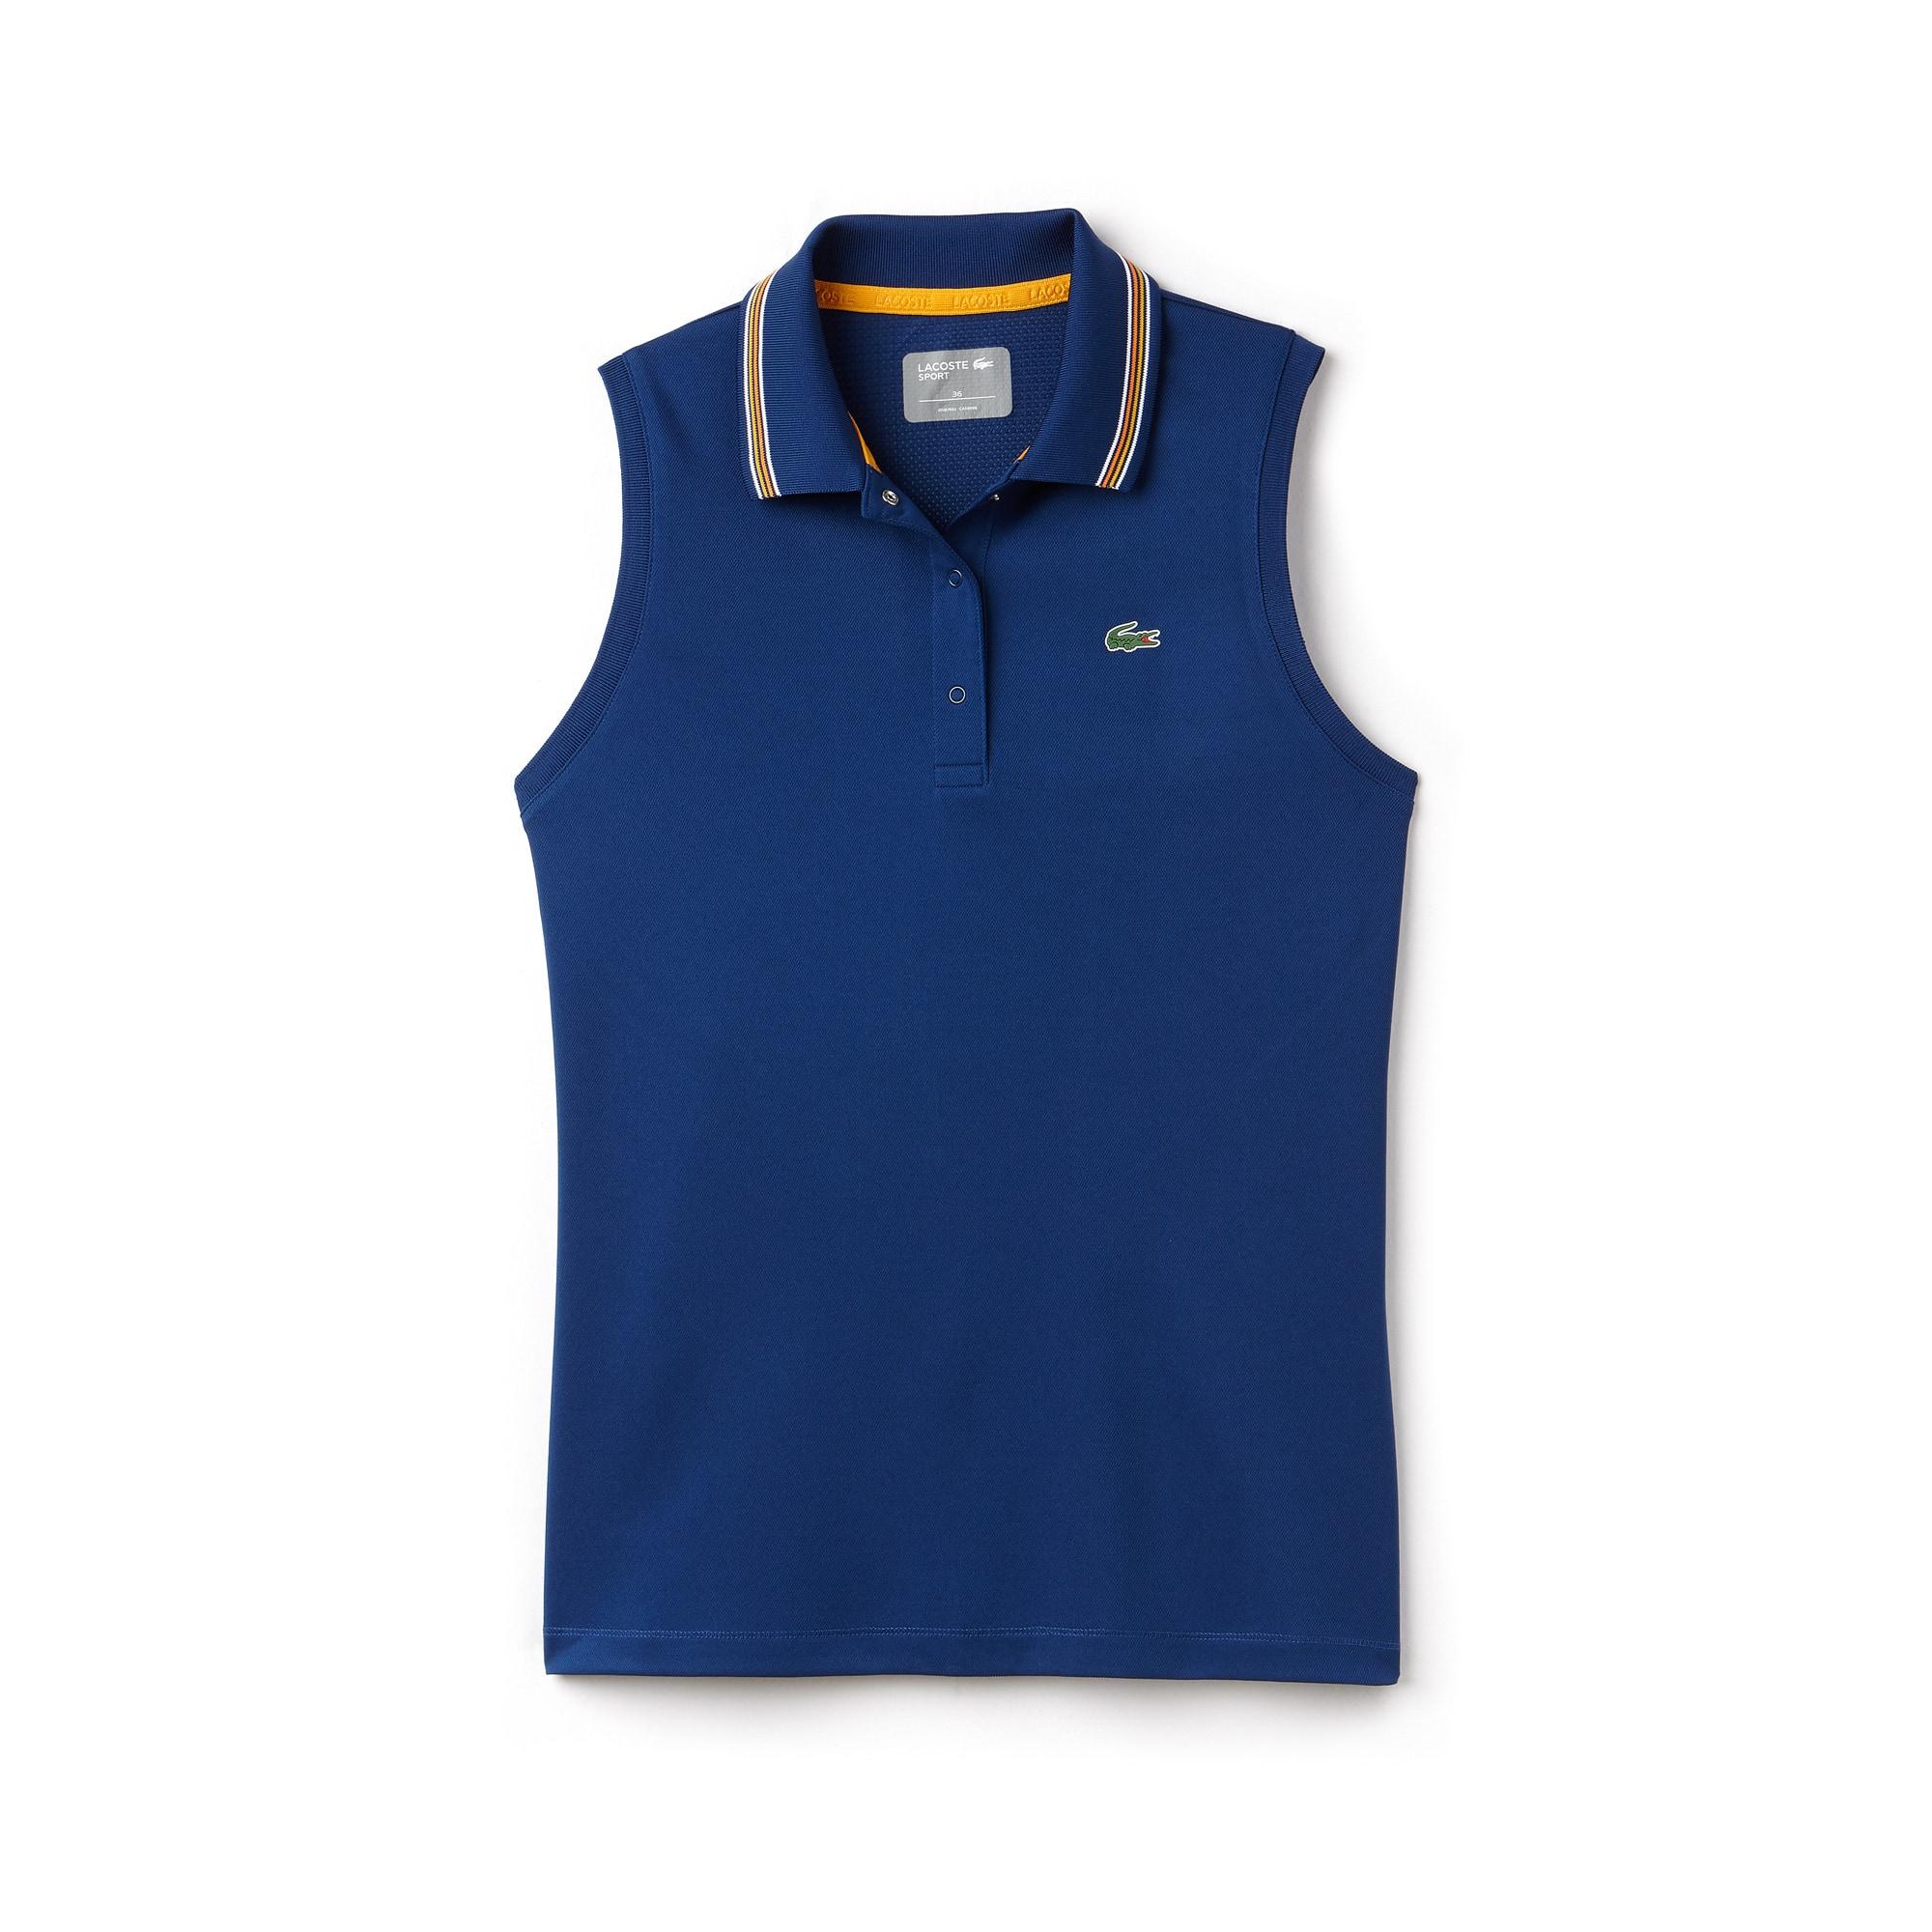 Women's Lacoste SPORT Tech Jersey And Piqué Tennis Polo Shirt